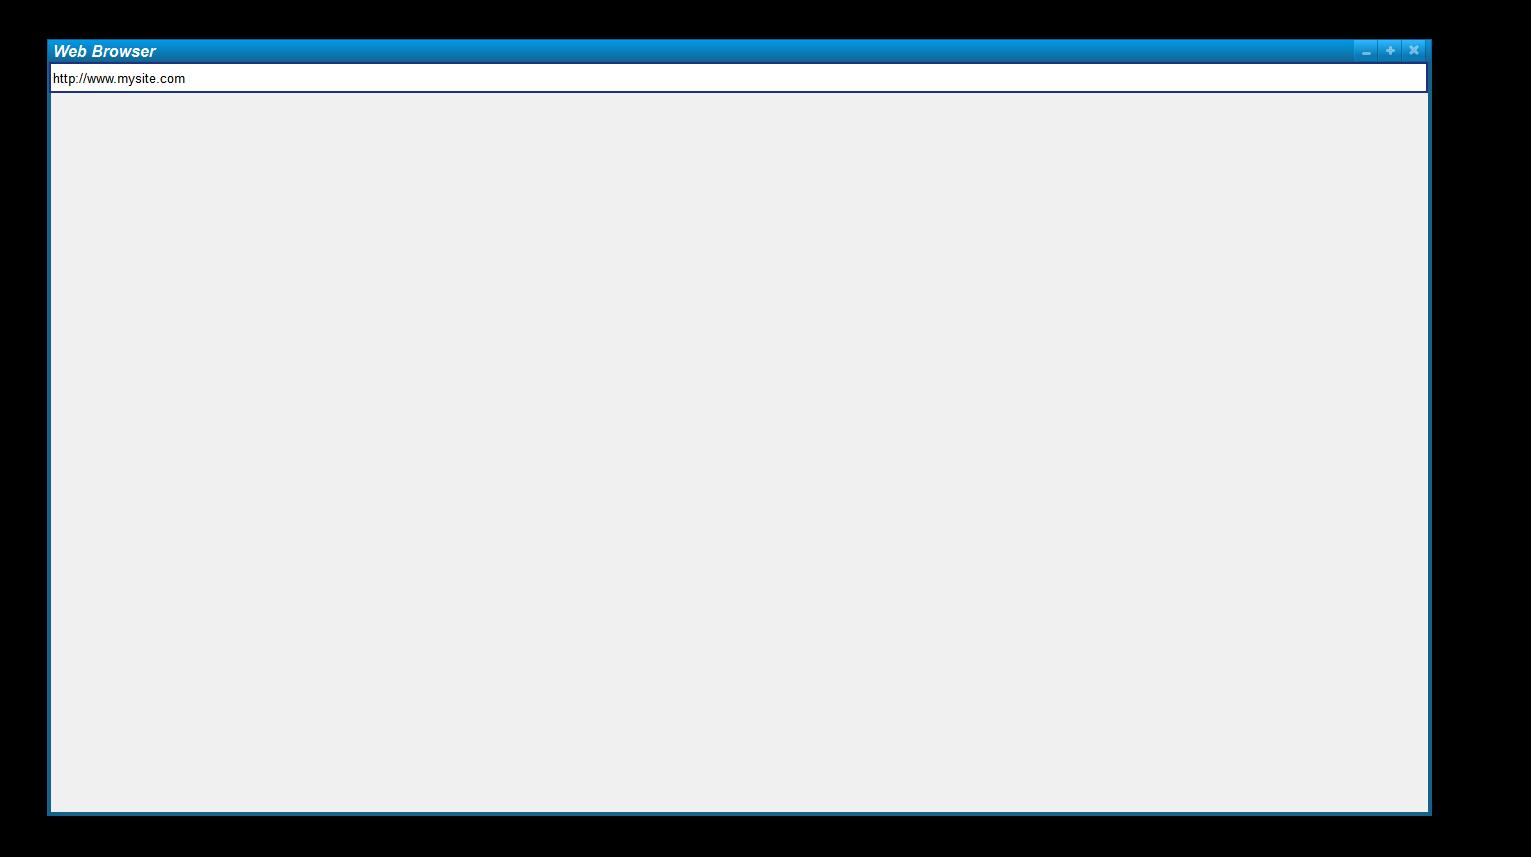 Website clipart browser. How can a jsp